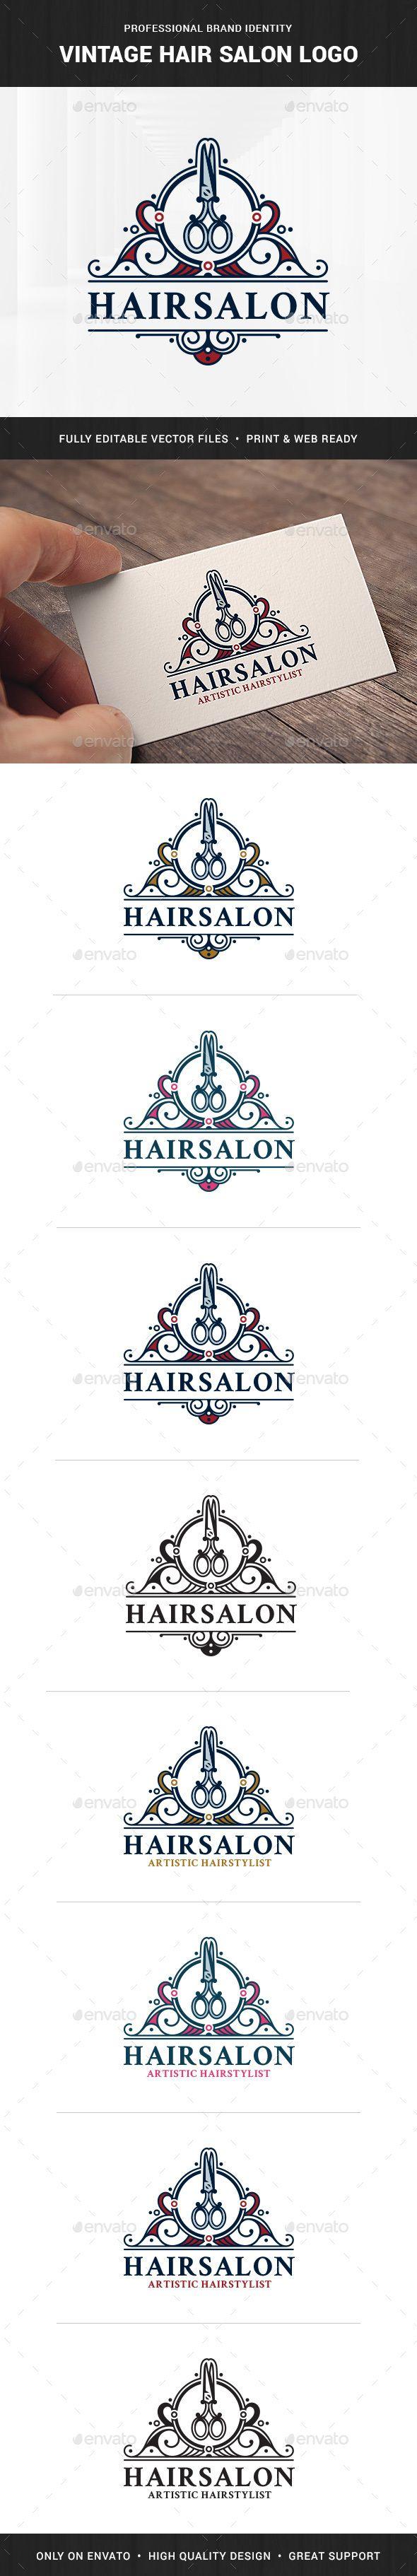 Vintage Hair Salon Logo Template - Crests Logo Templates    Download & View Here :   https://graphicriver.net/item/vintage-hair-salon-logo-template/21382002?s_rank=25&ref=RipsSlinger  #logo #hairsalon #premiumdesignart